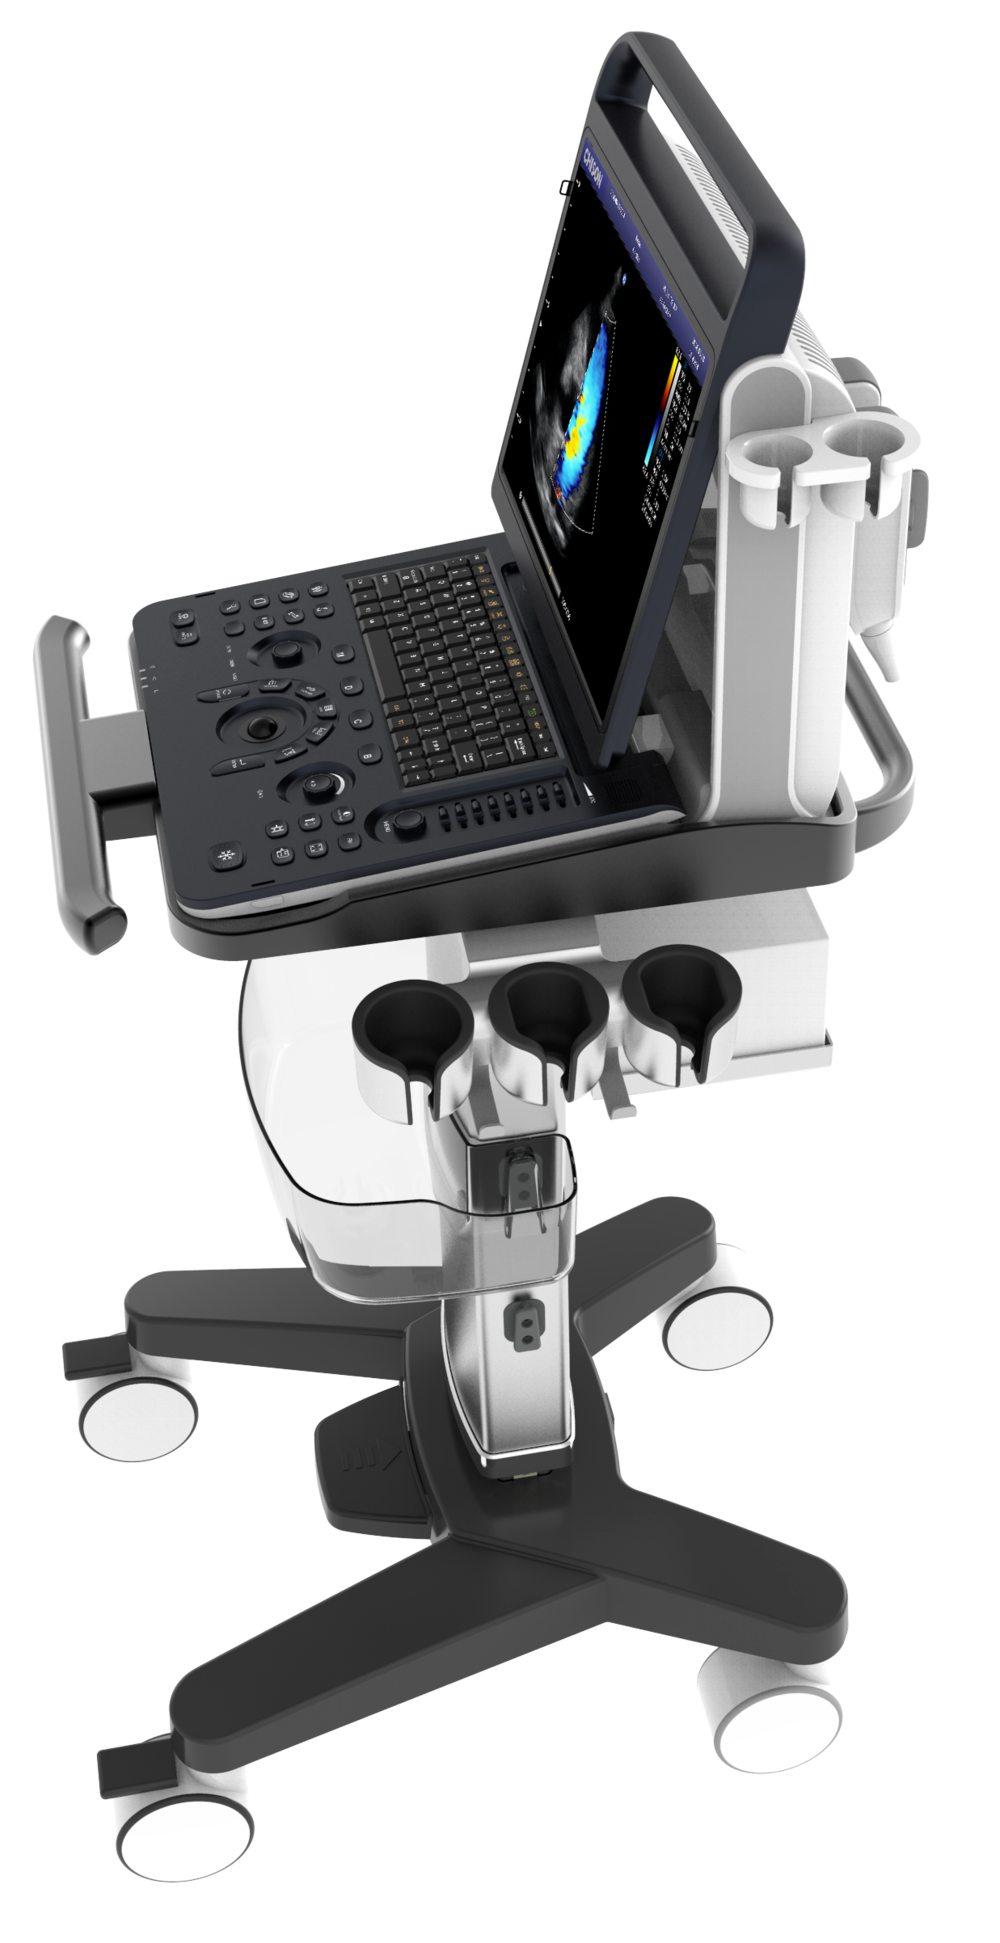 EBit-cart-201629.png